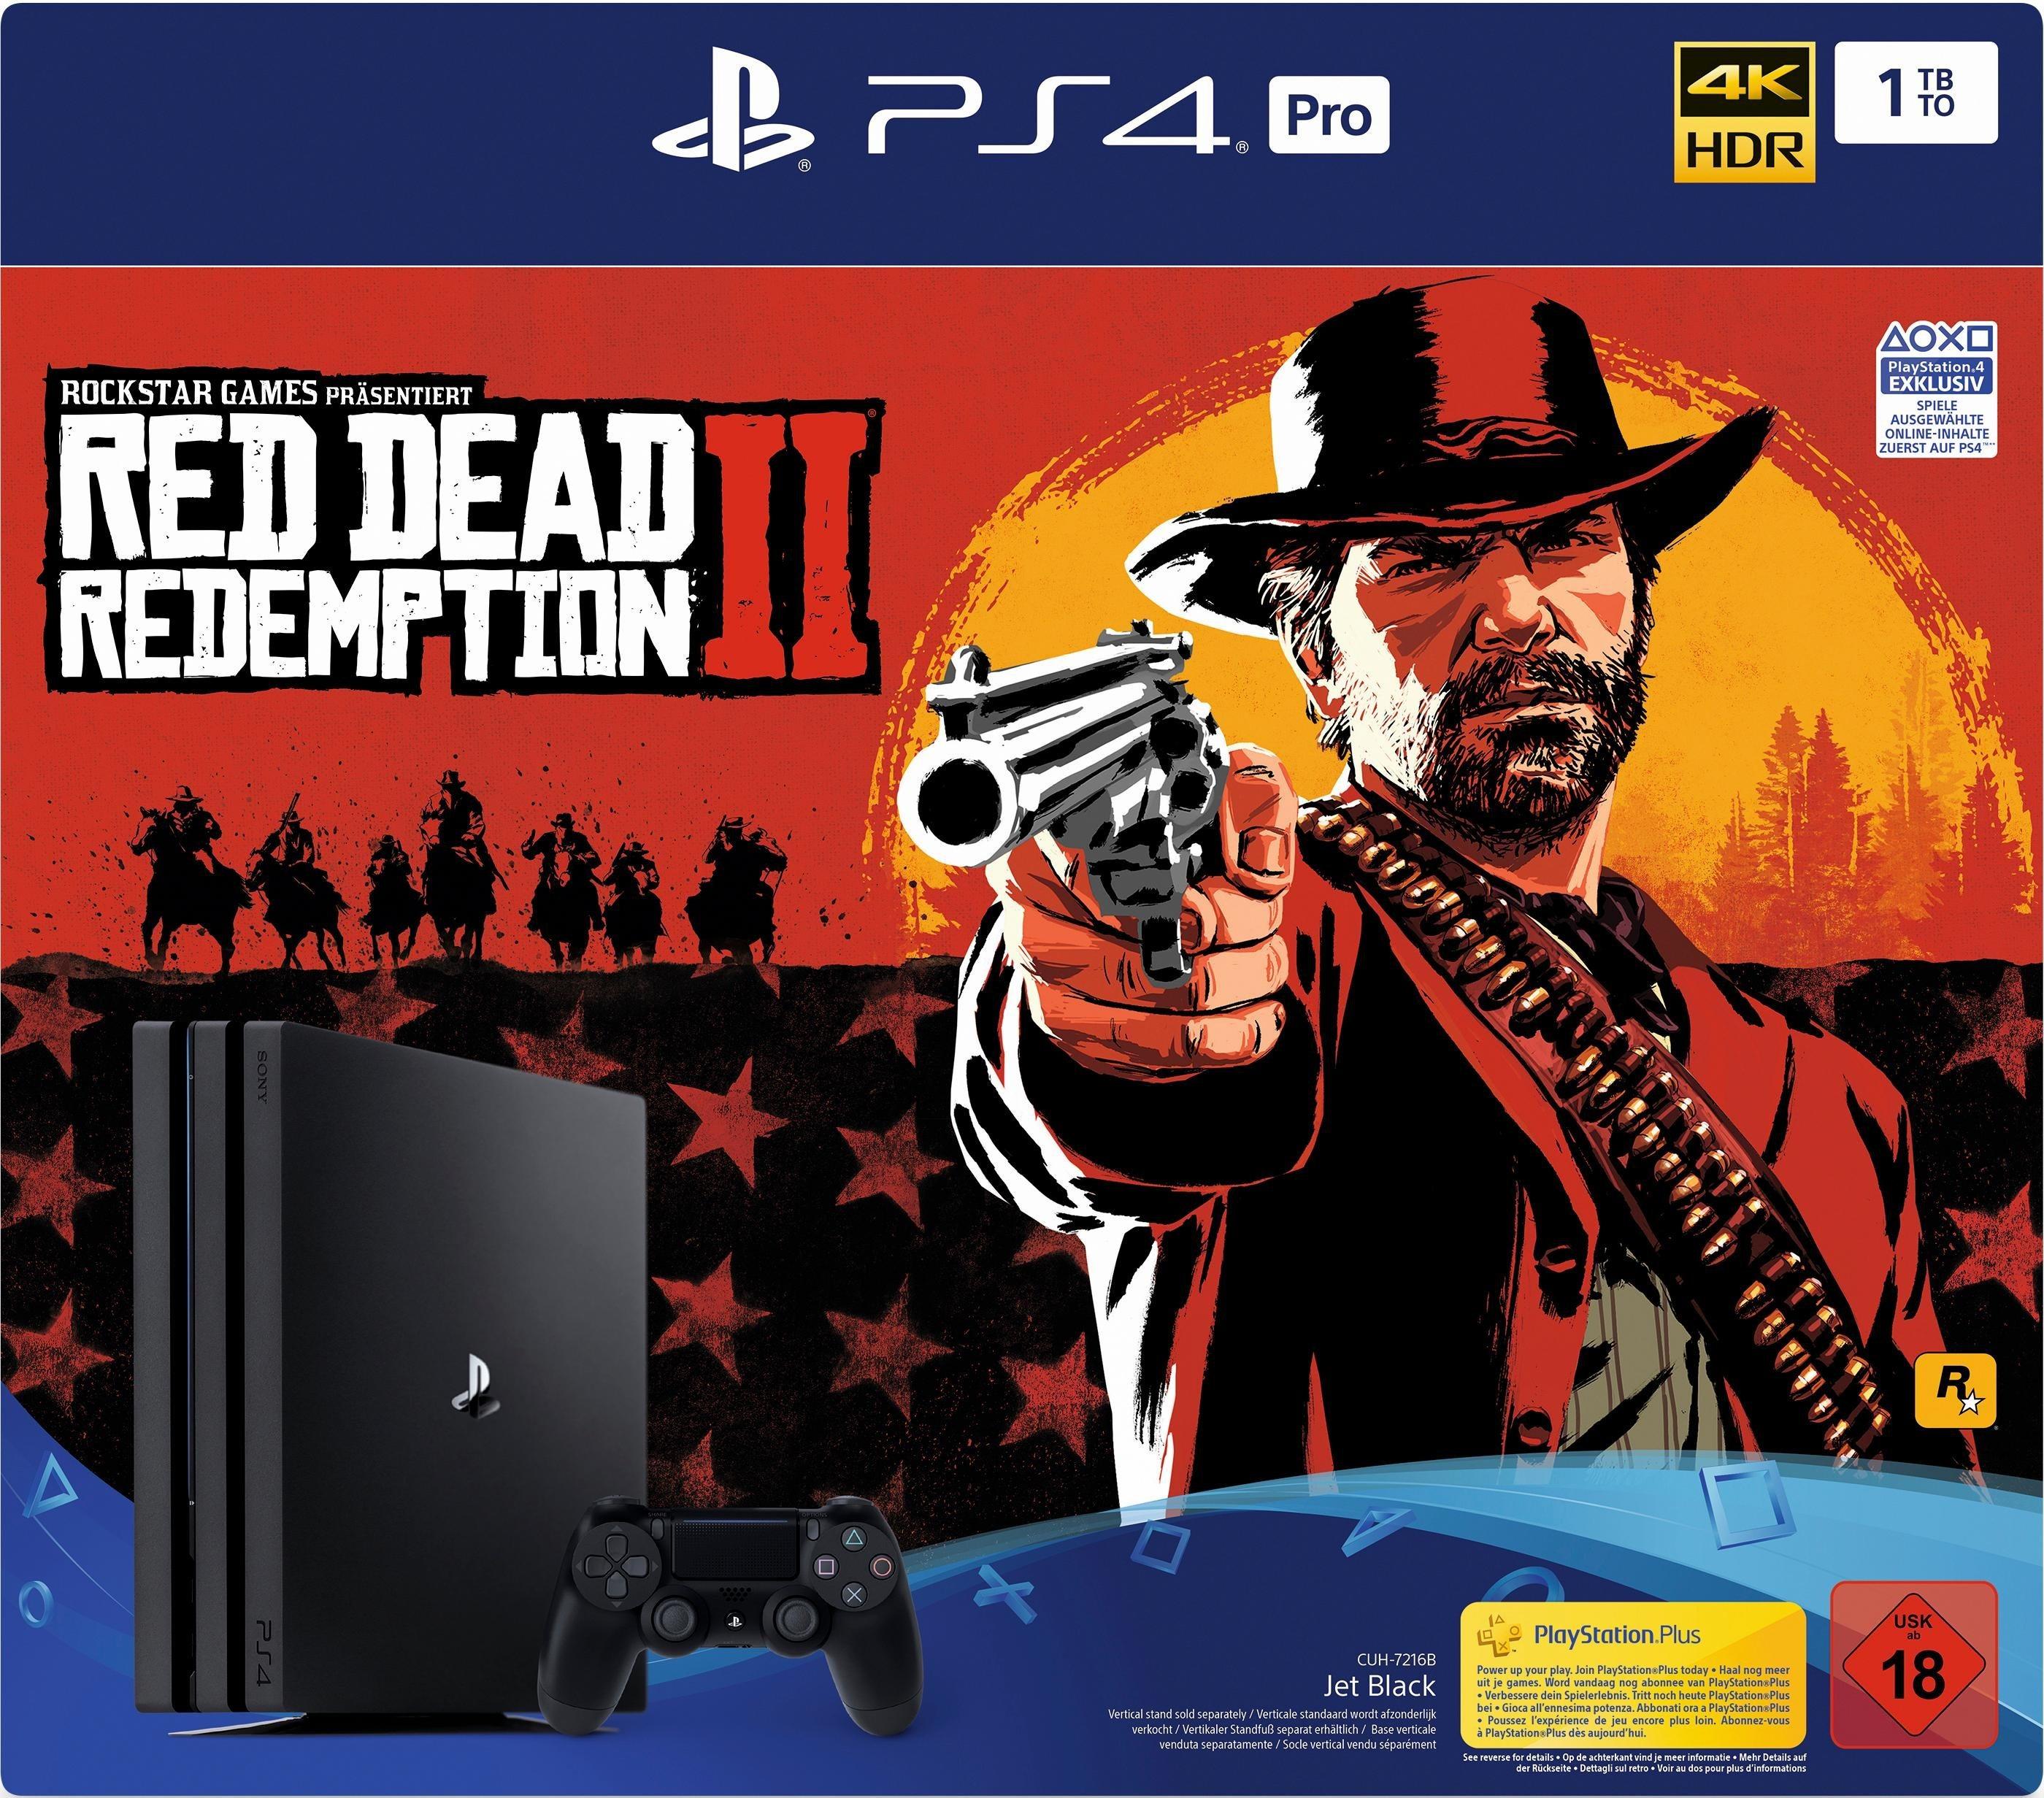 PlayStation 4 Pro (PS4 Pro) 1TB (Bundle, incl. Red Dead Redemption 2)